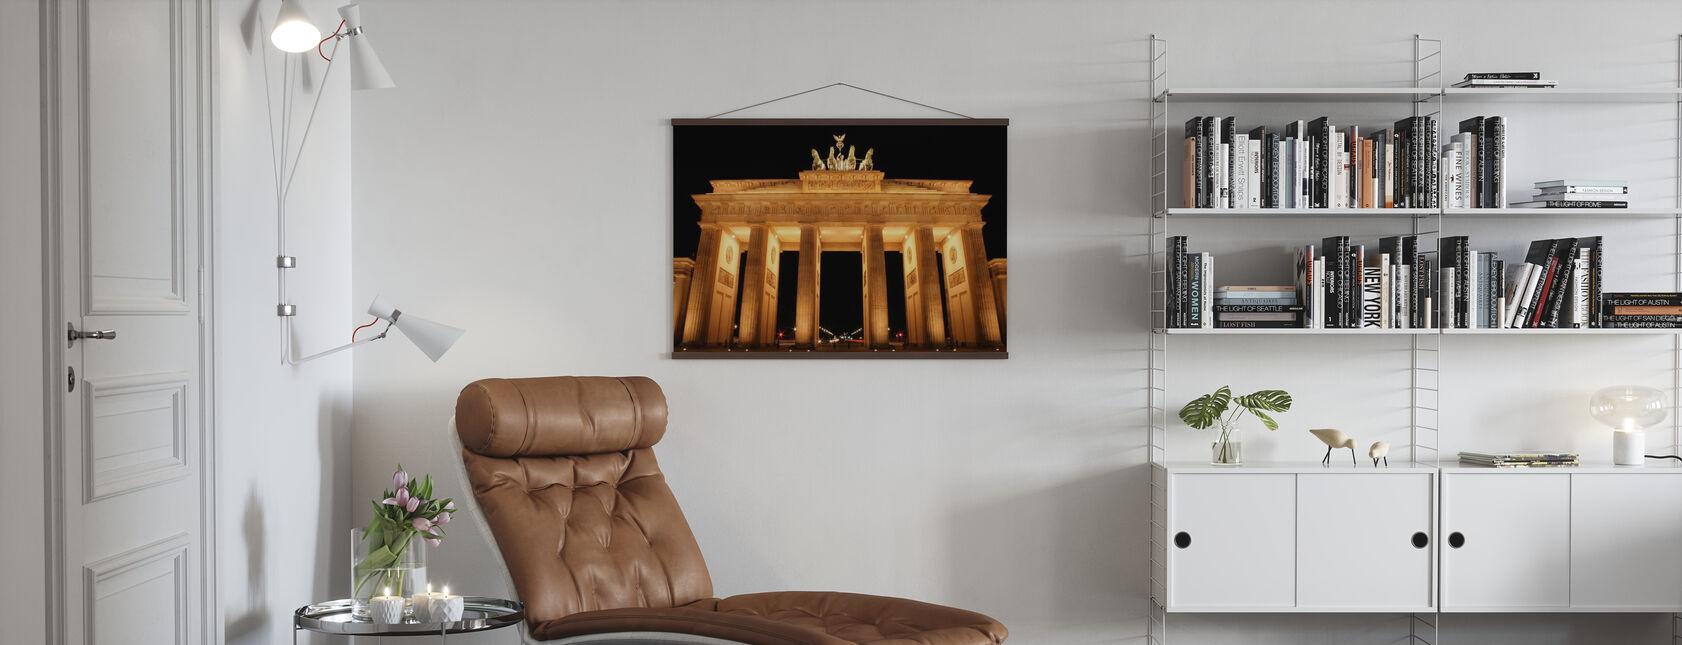 Brandenburger Tor bij Nacht - Poster - Woonkamer